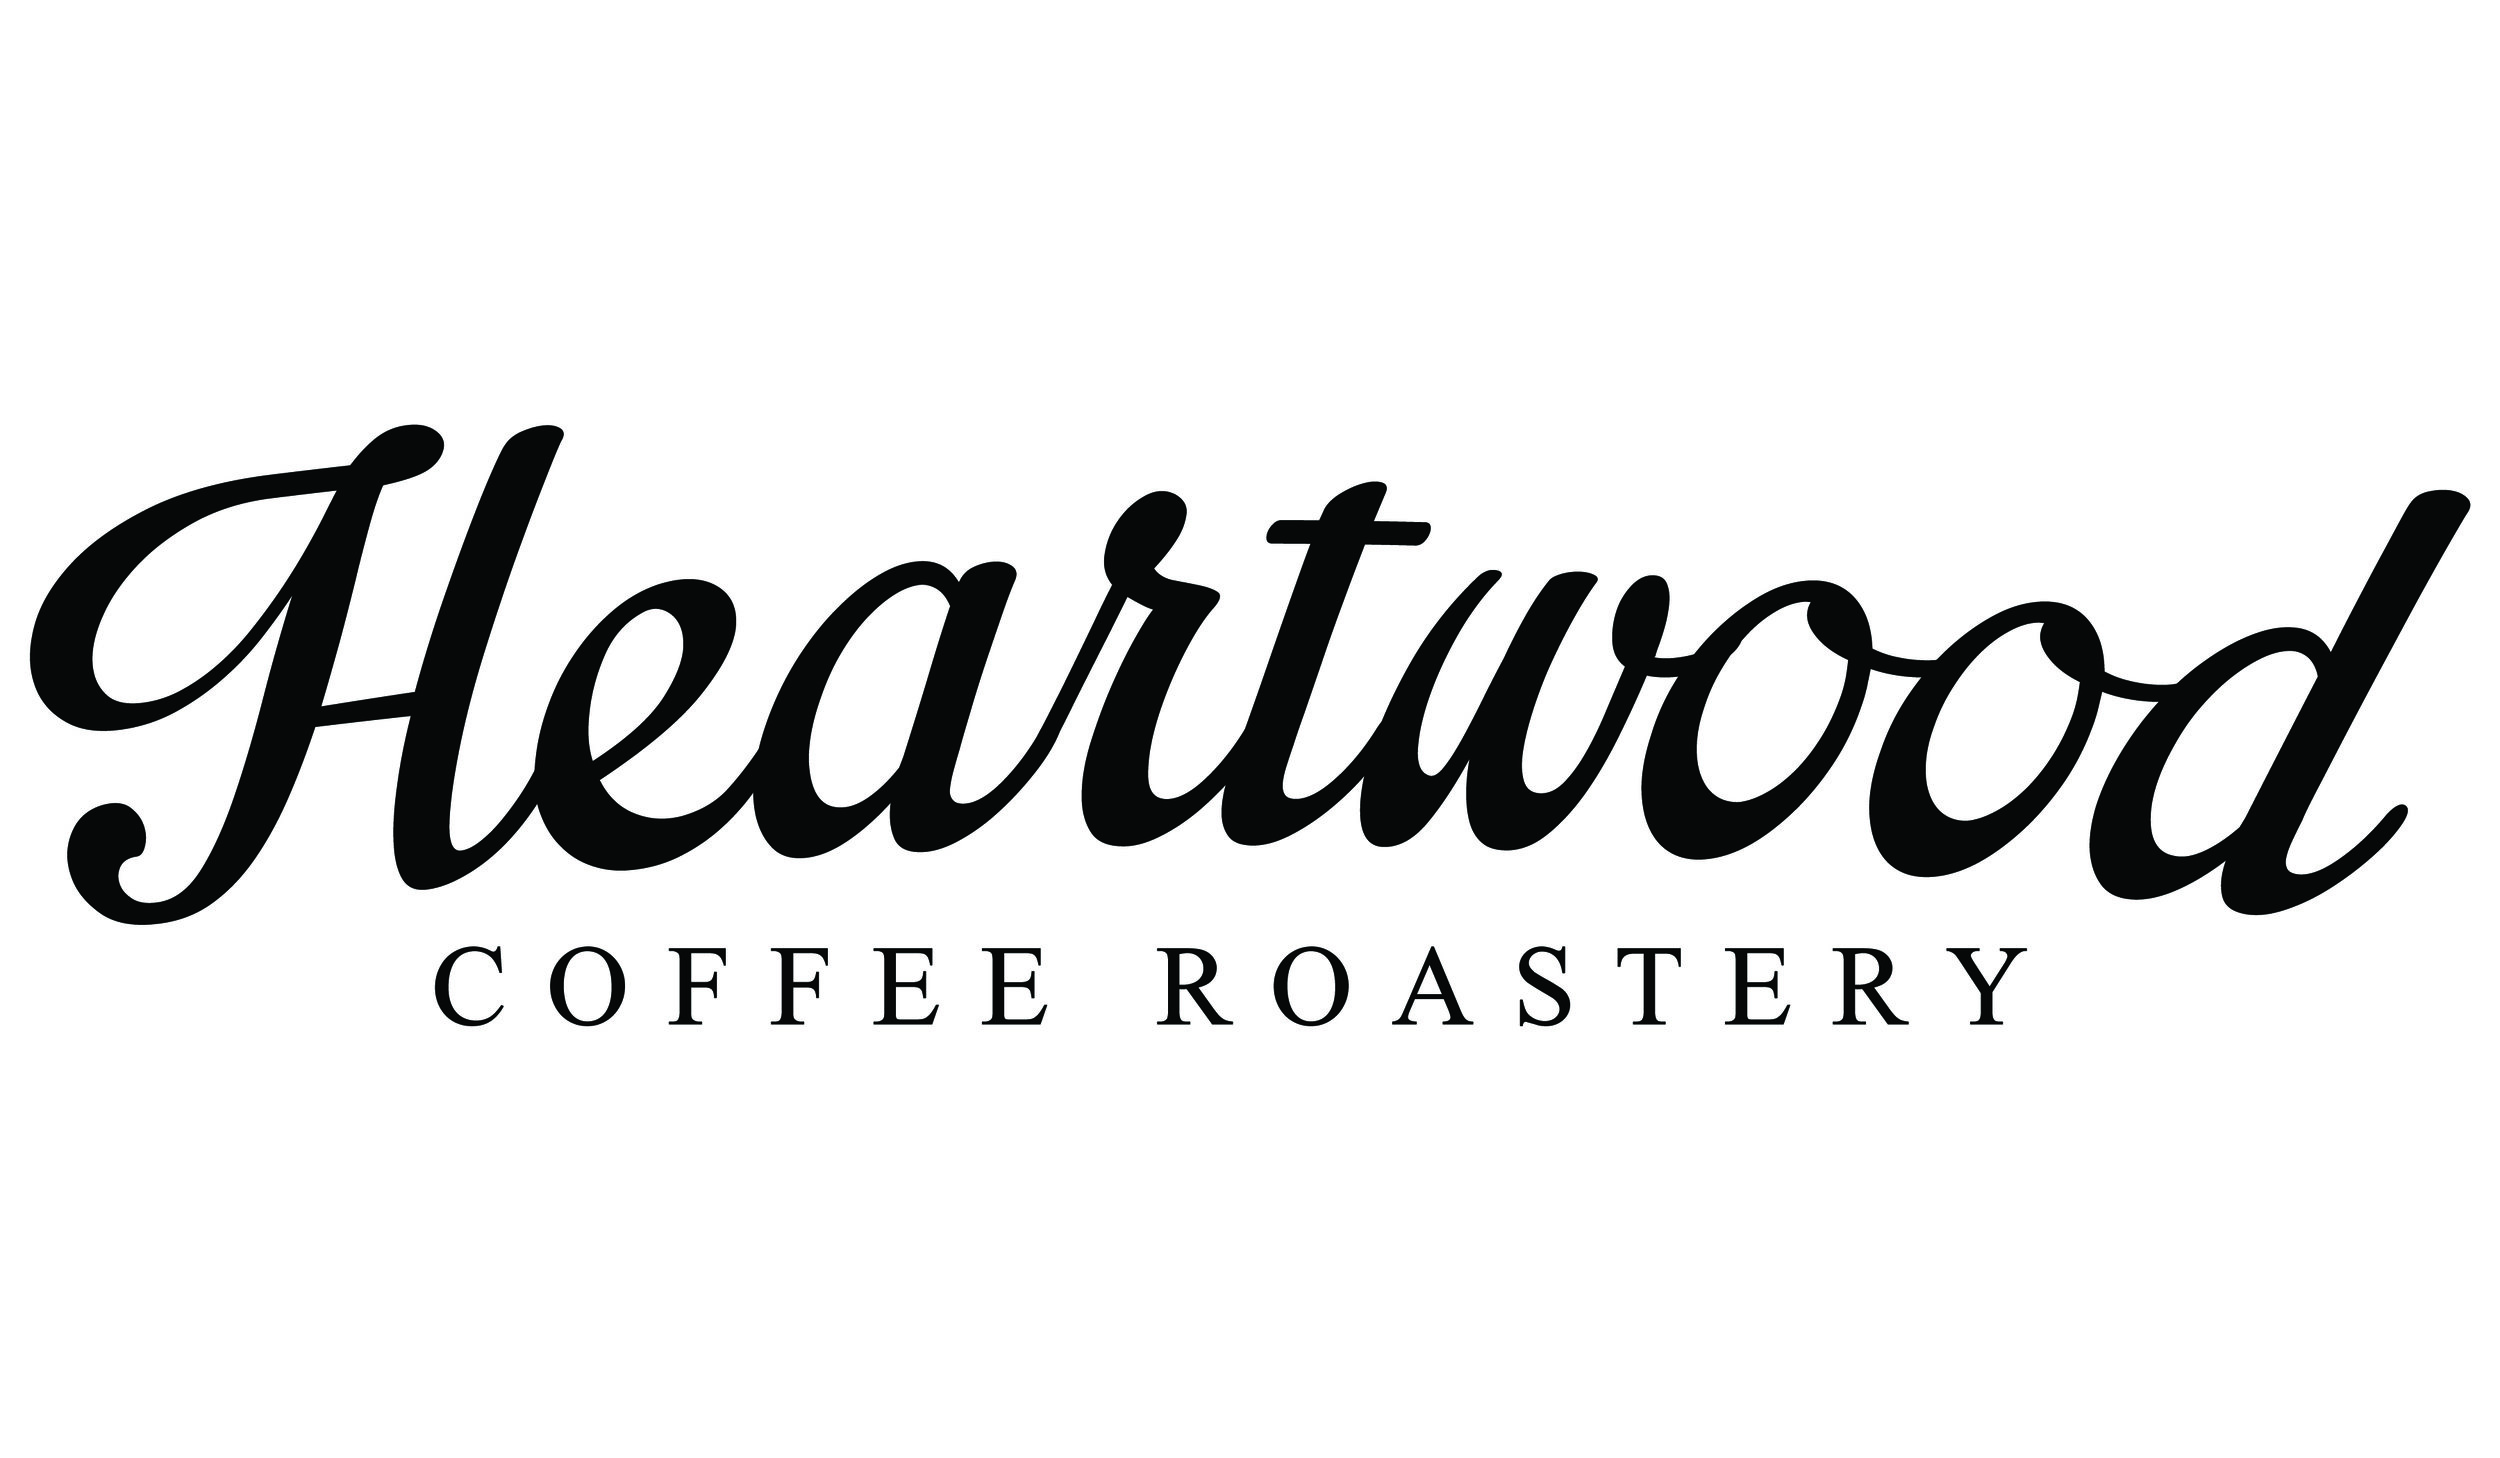 www.heartwoodroastery.com